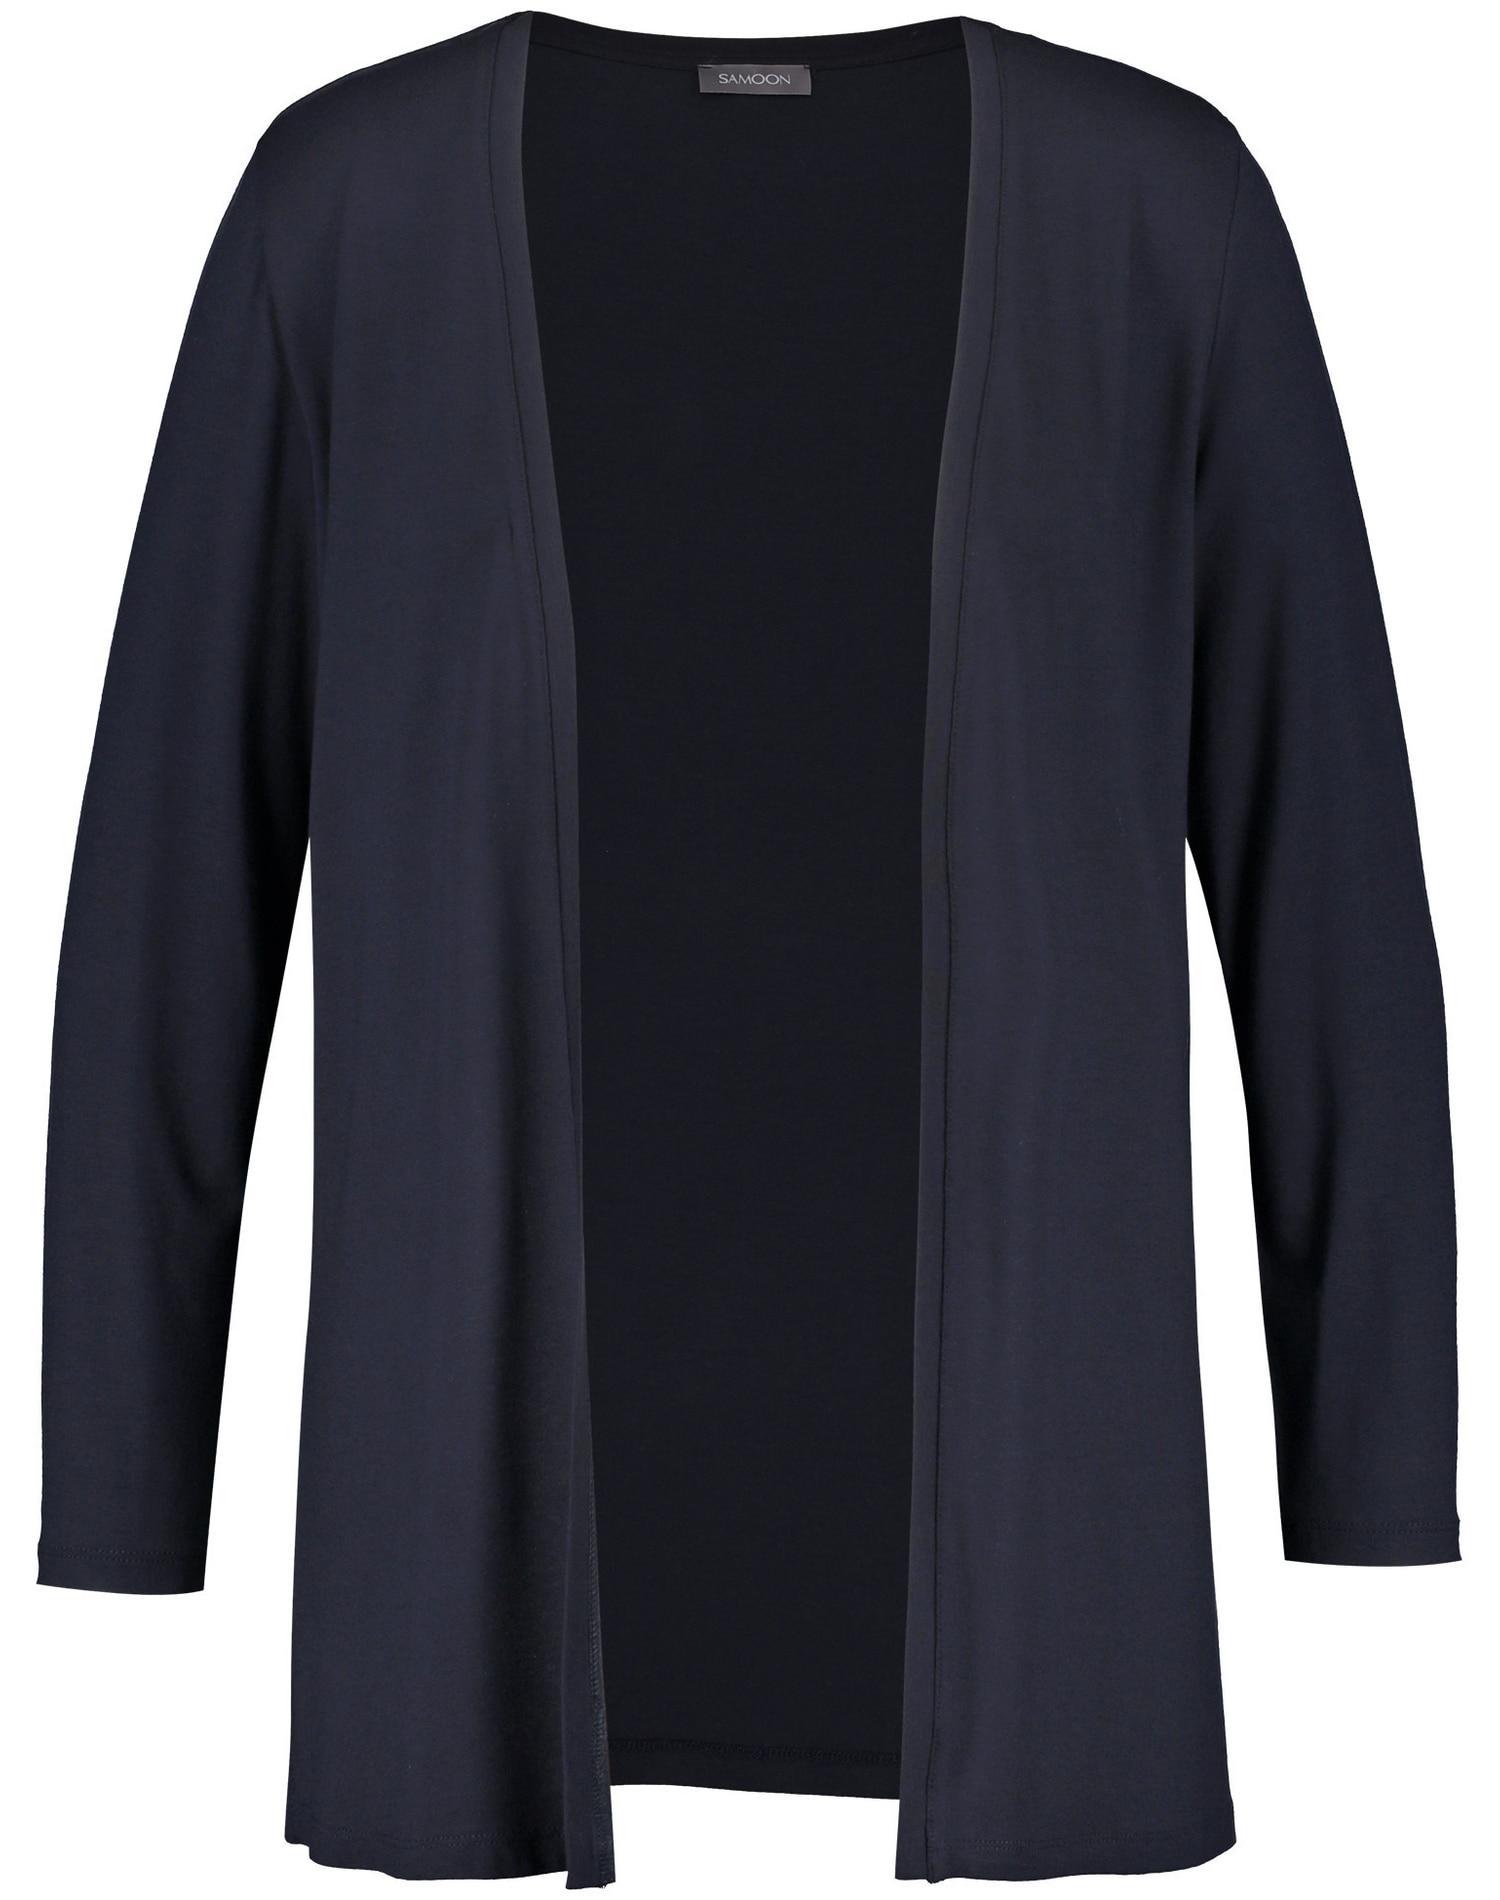 Samoon Jacke Gewirke Offene Shirtjacke Damenmode/Bekleidung/Shirts & Sweatshirts/Shirtjacken & Boleros